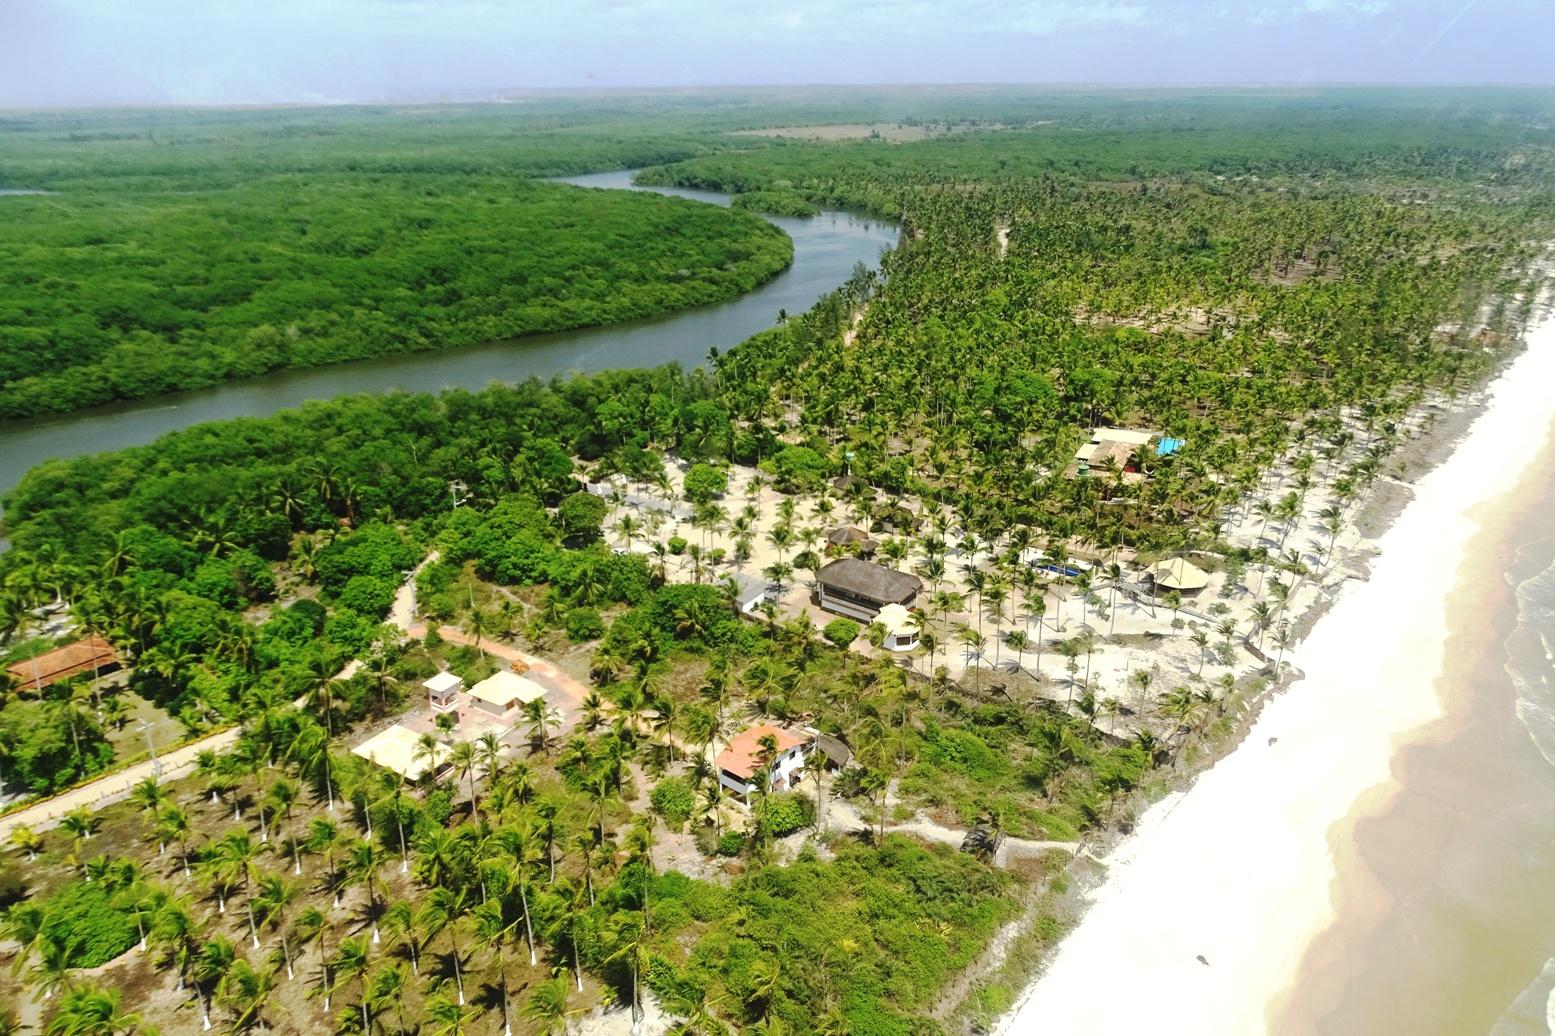 strandhaus,Bahia,Brasilien,Canavieiras